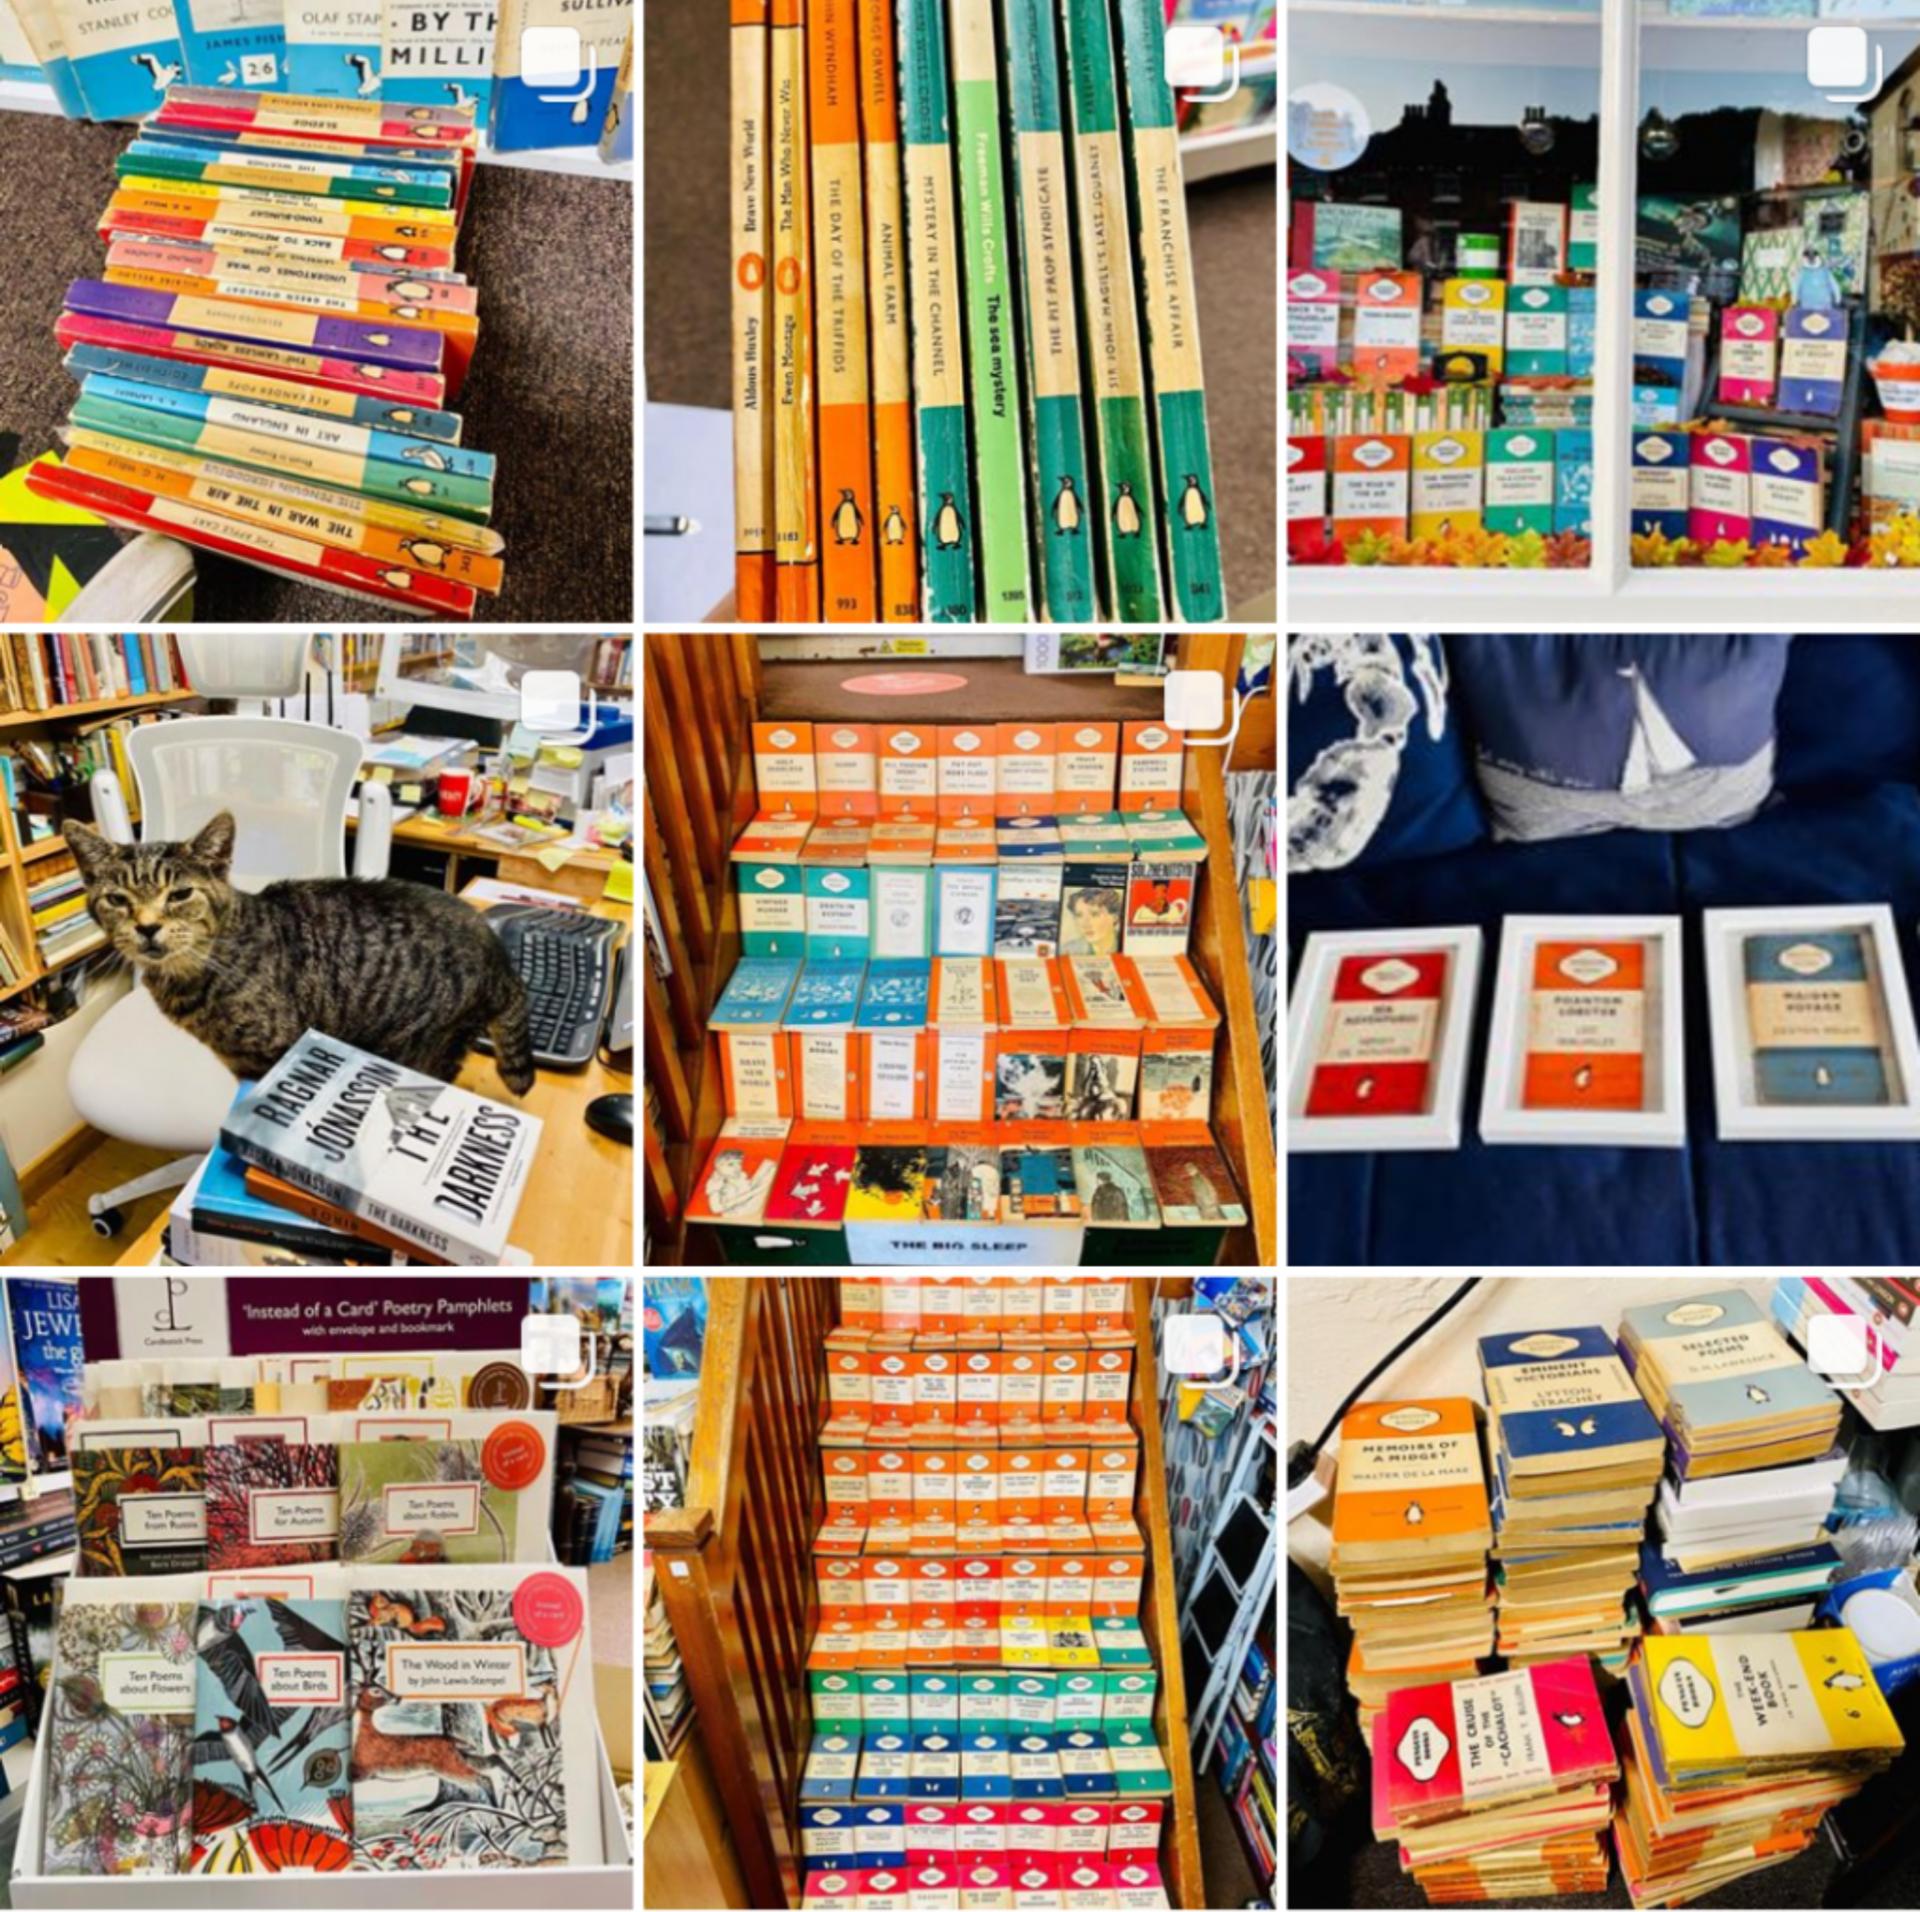 The Ironbridge Bookshop Bookstagram feed for Interview with a Bookstagrammer The Ironbridge Bookshop